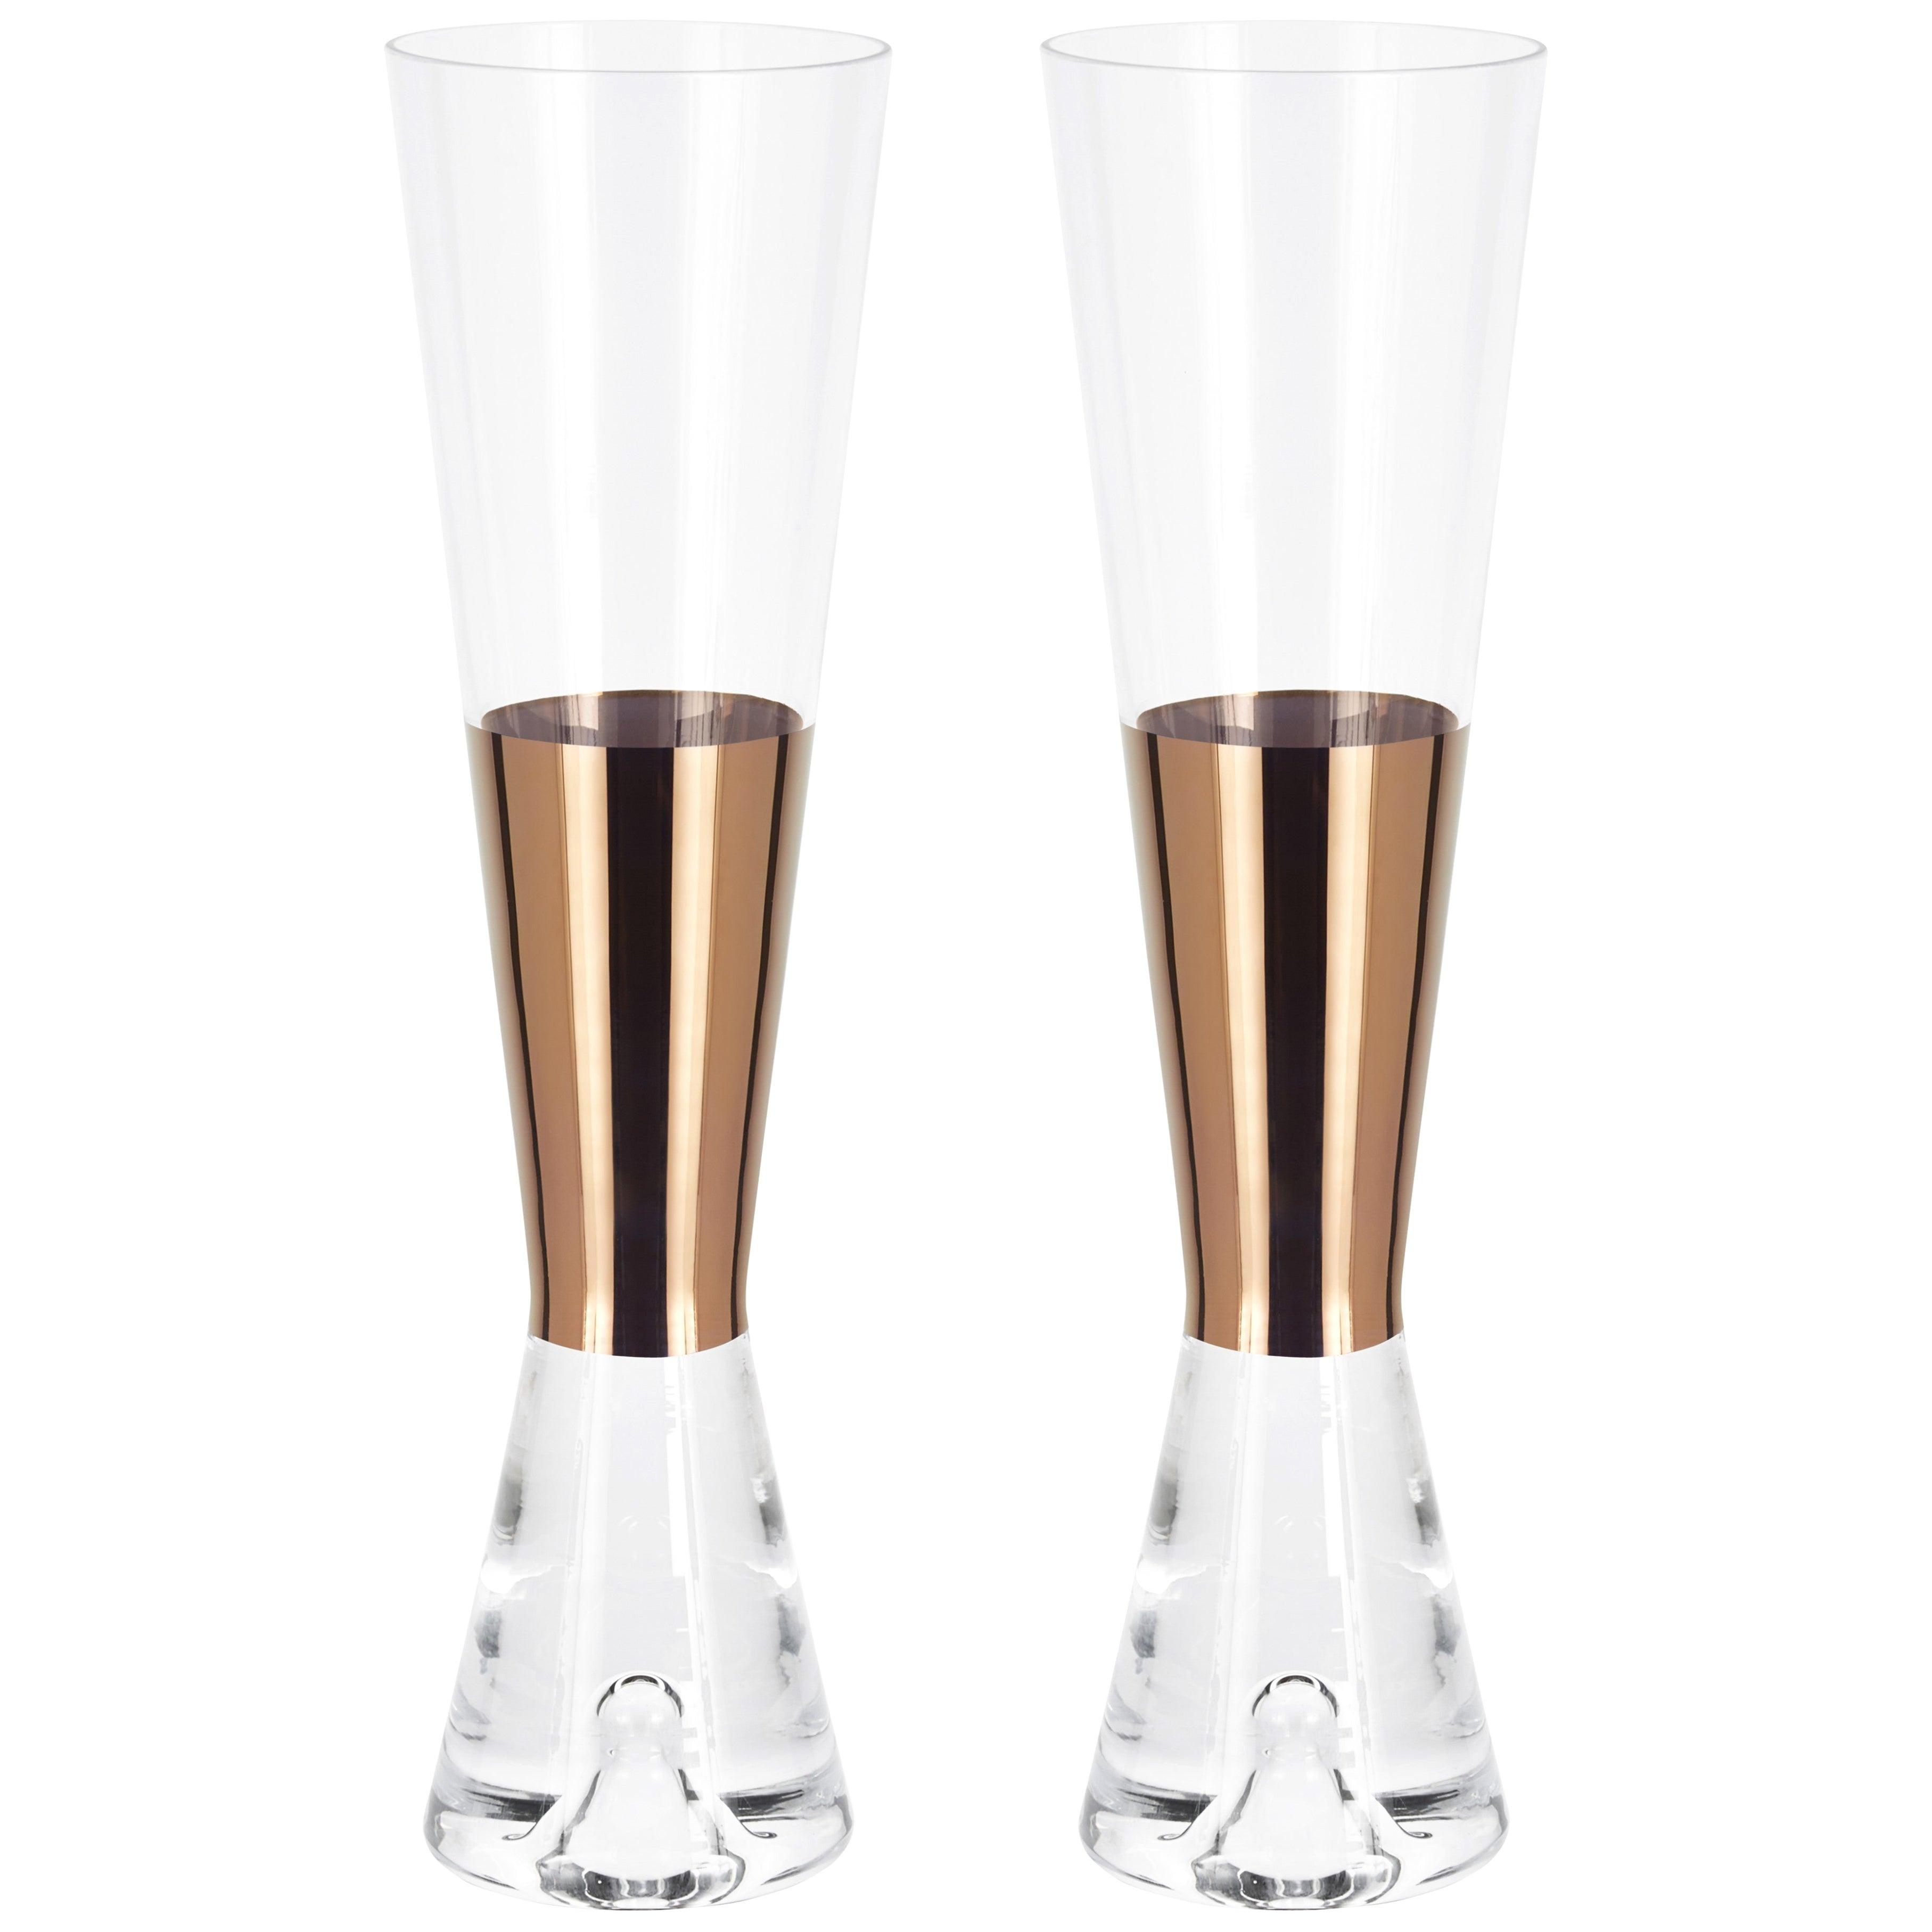 Tom Dixon Champagne Glasses Copper, Set of 6